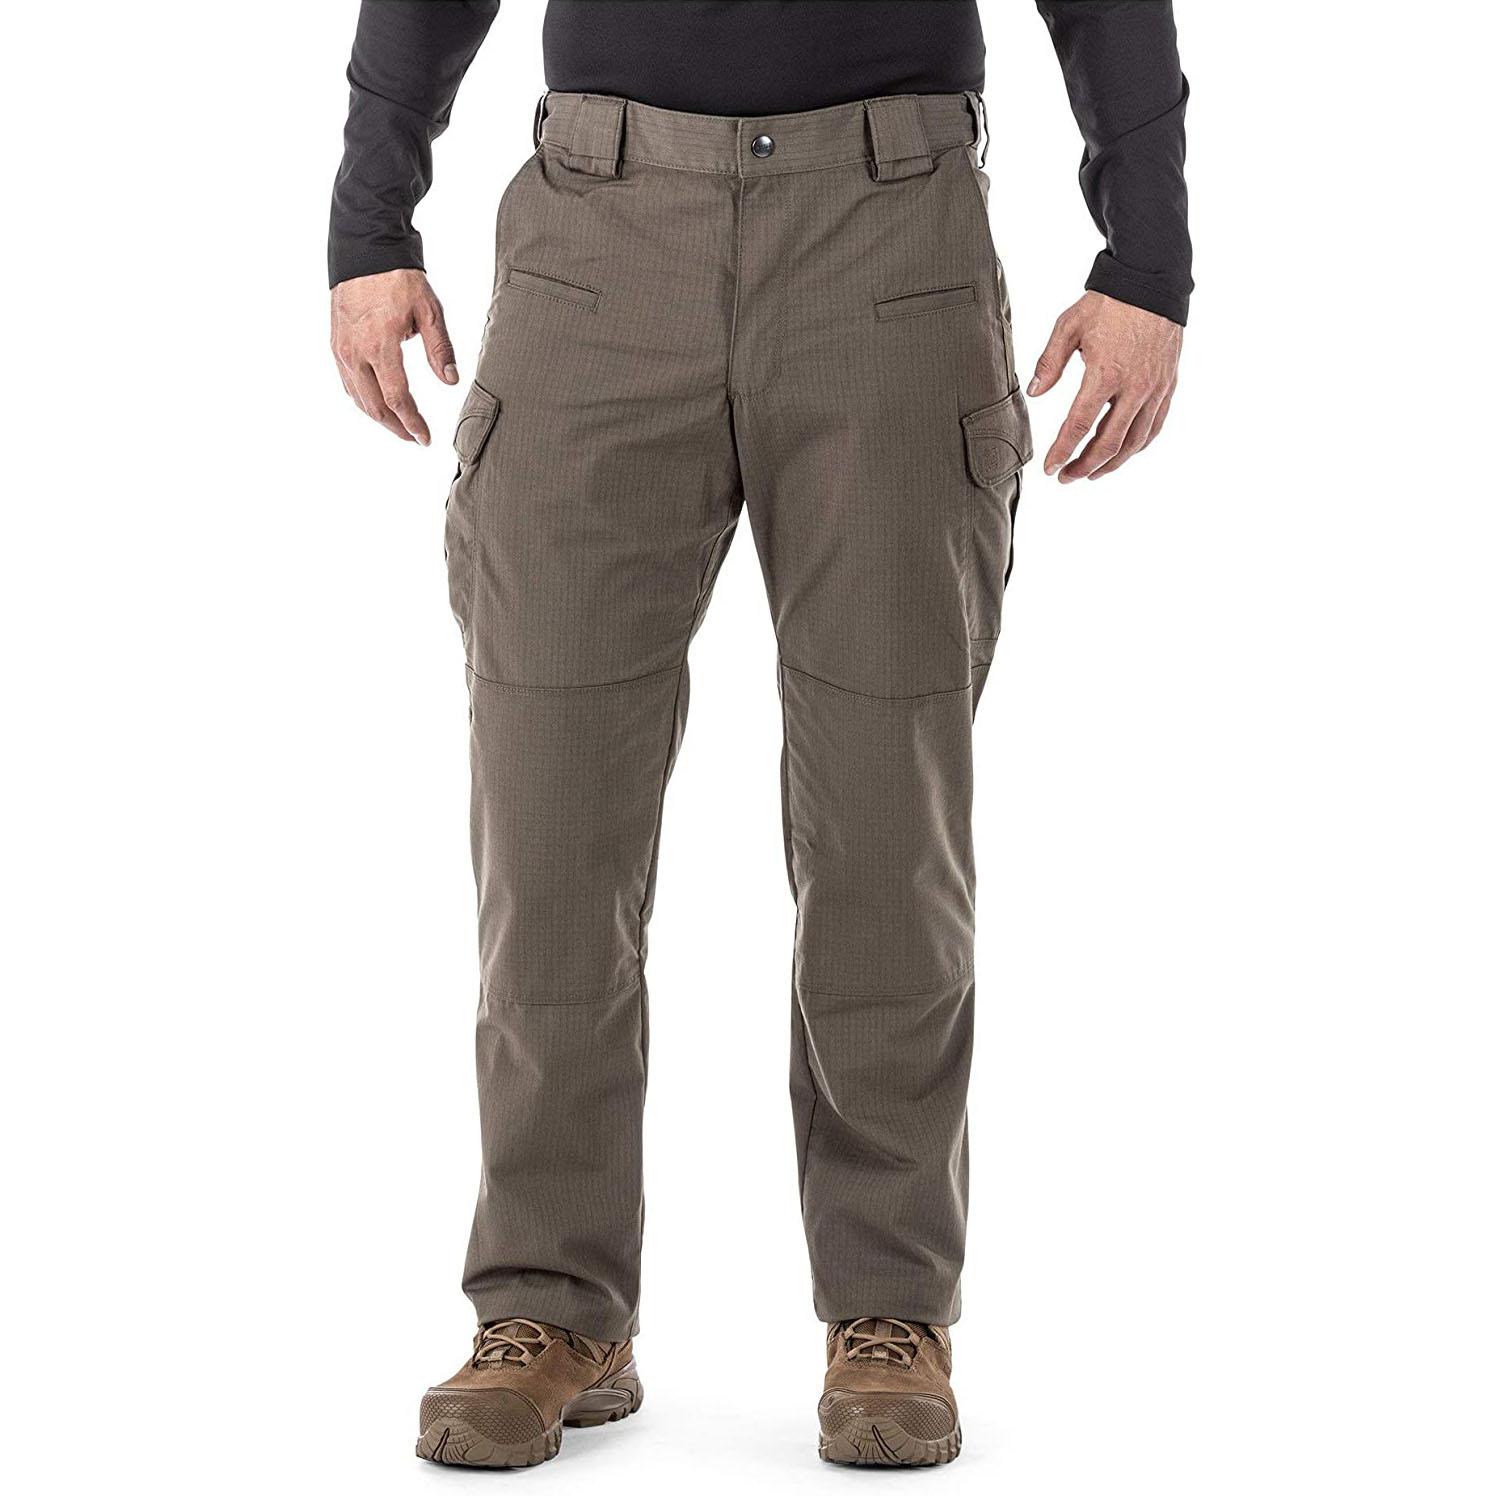 5.11 Tactical Stryke Operator Uniform Pants